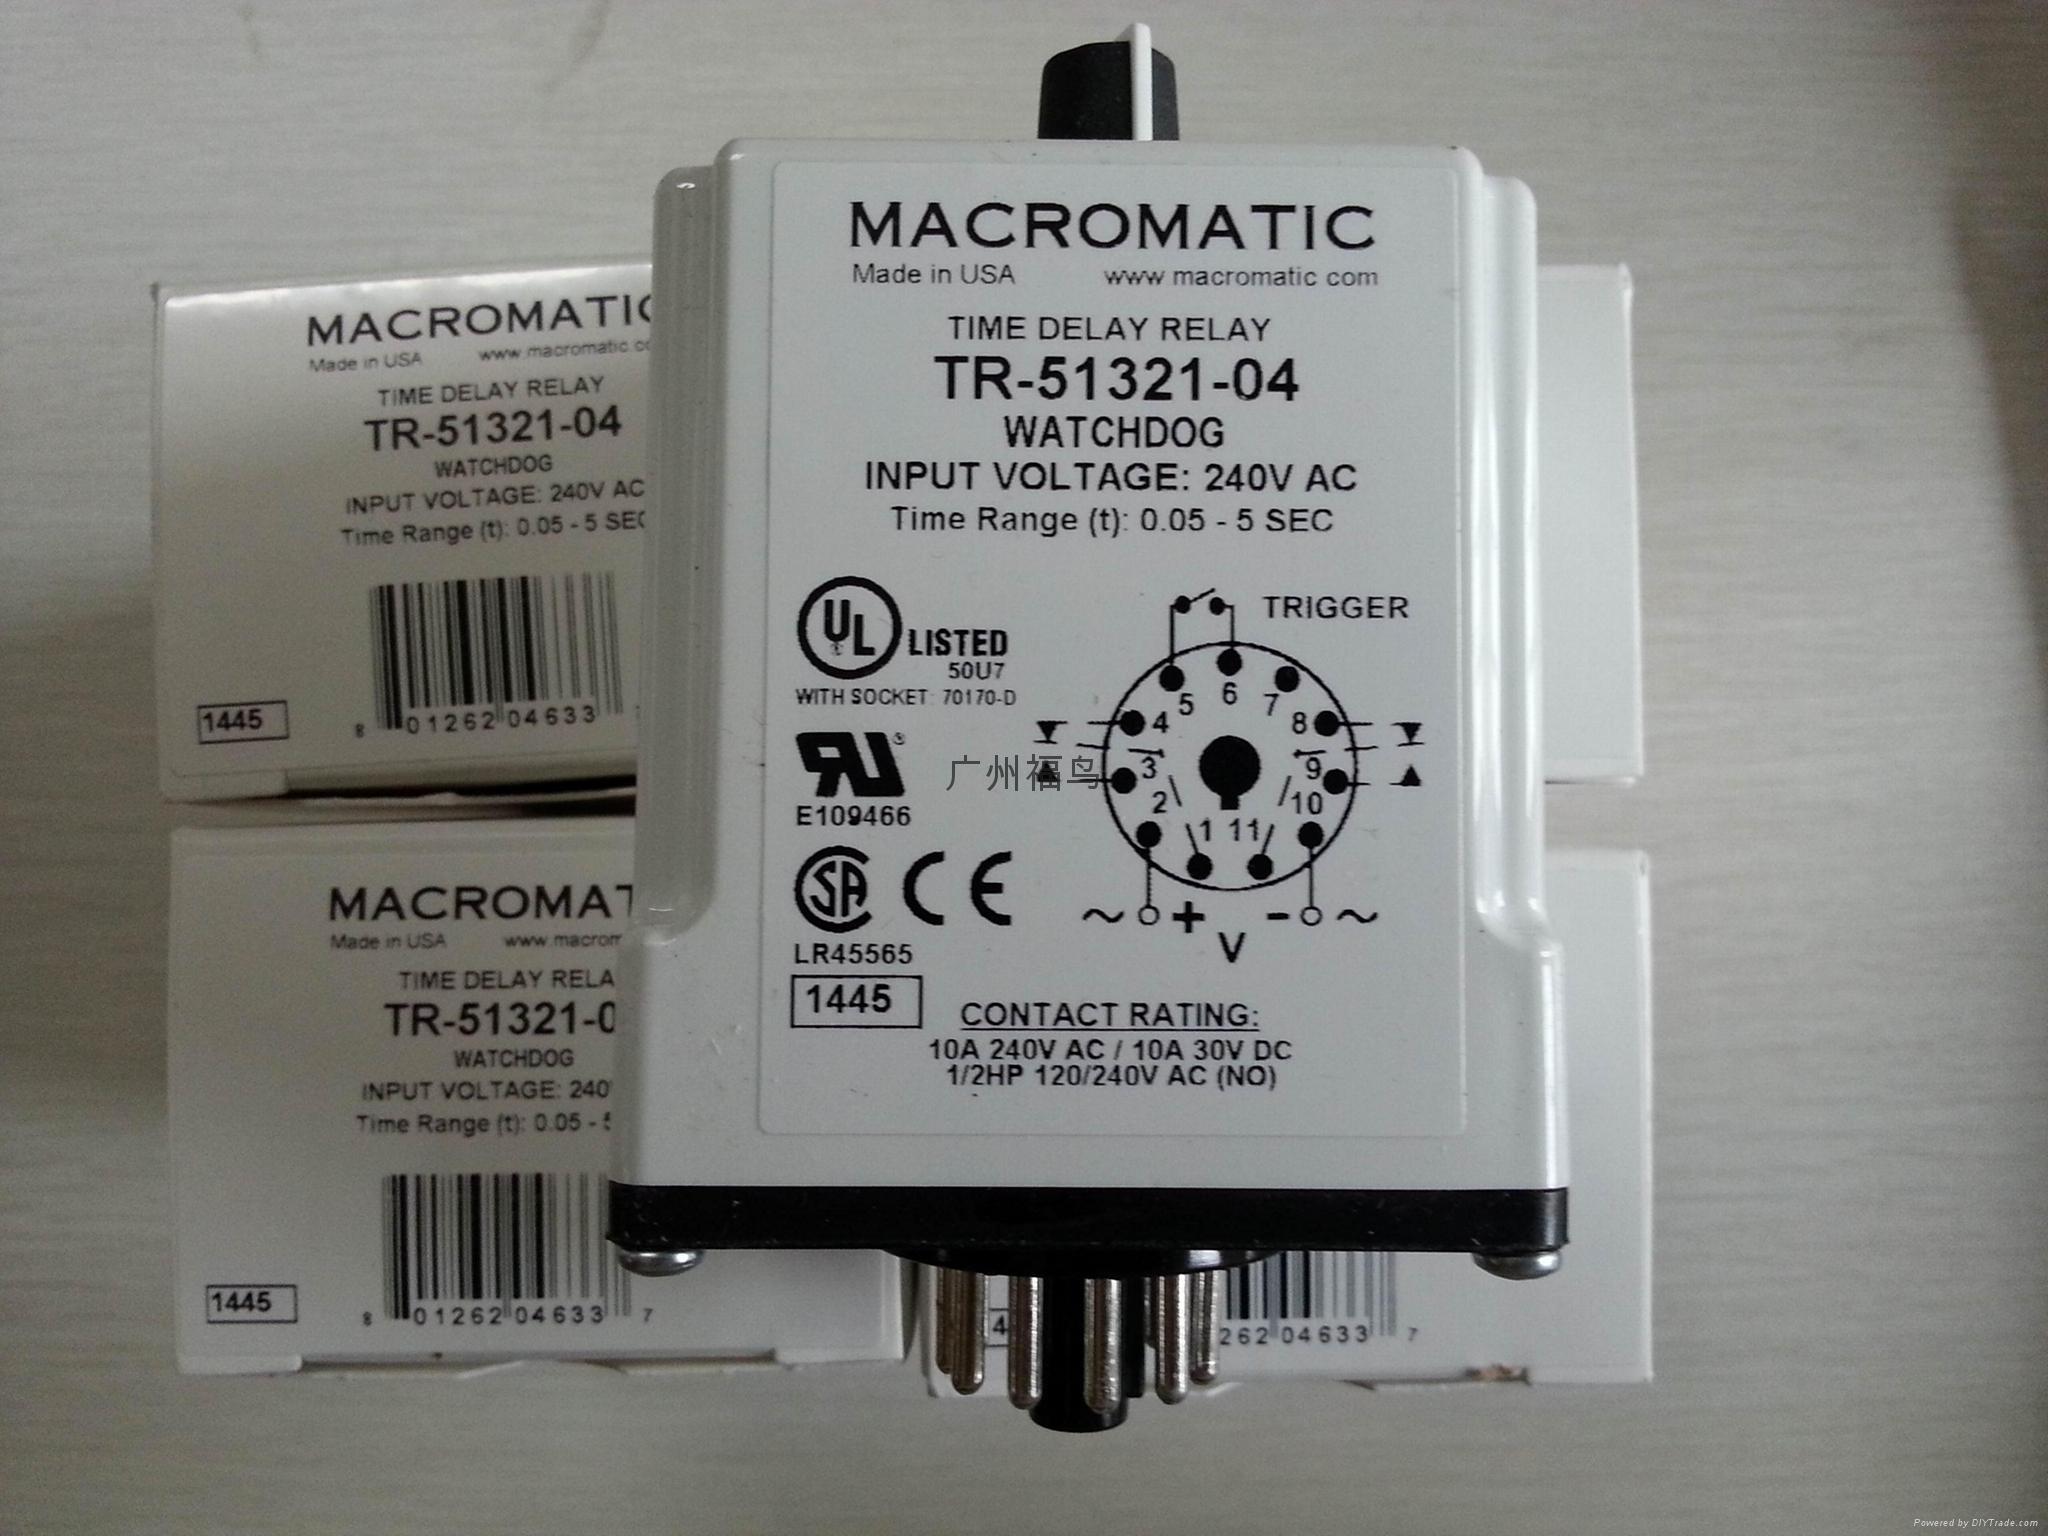 MACROMATIC时间继电器, 型号: TR-51321-04